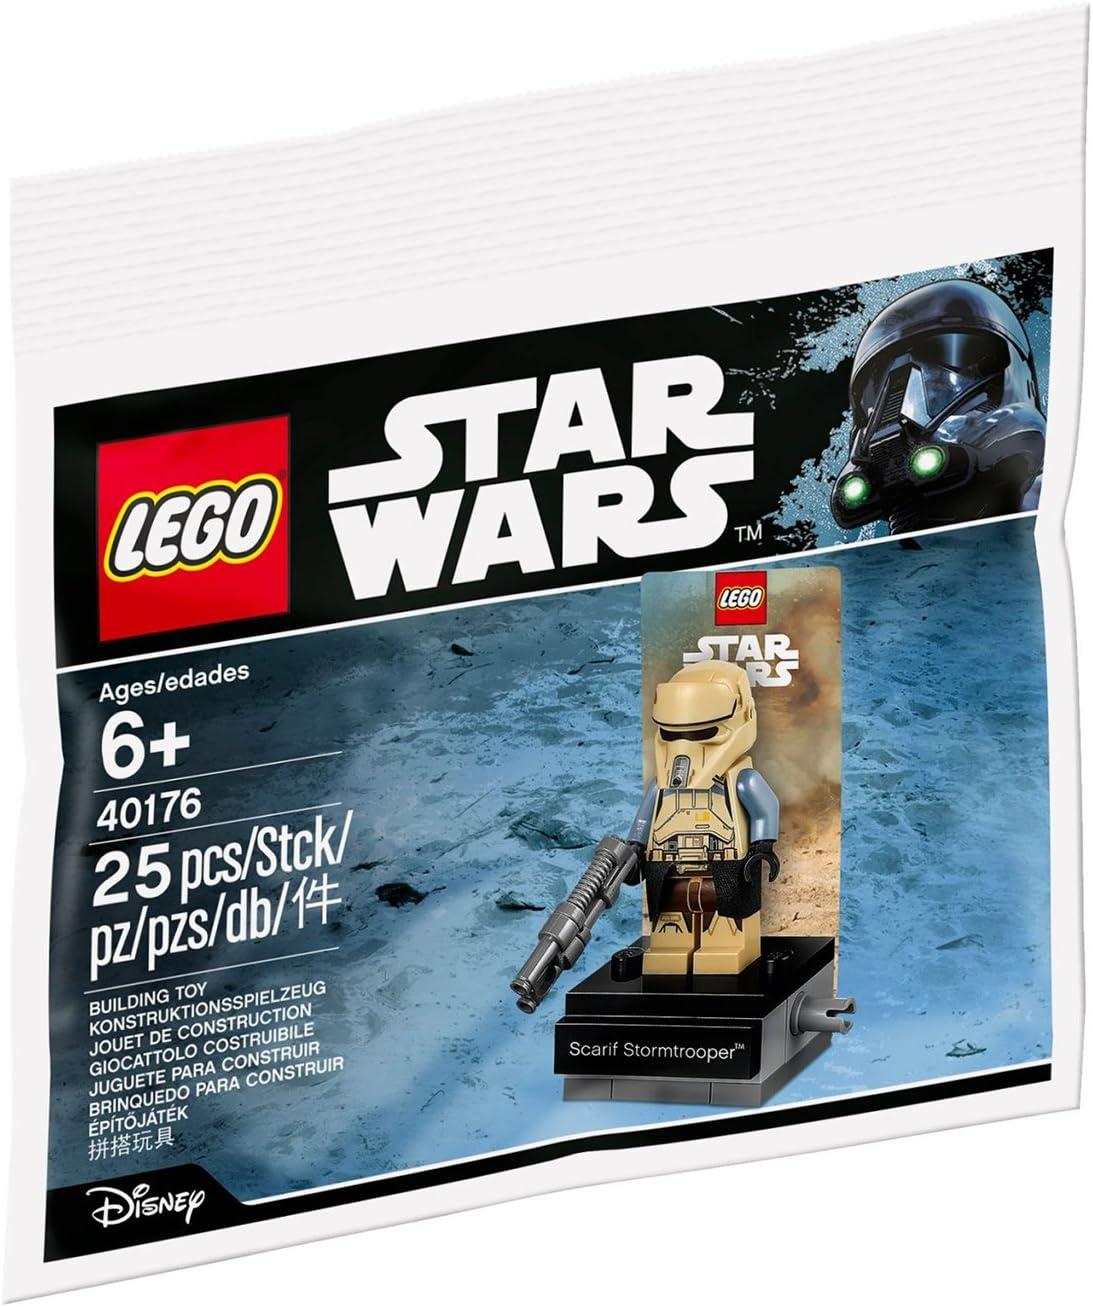 LEGO Star Wars 40176 Scarif Stormtrooper